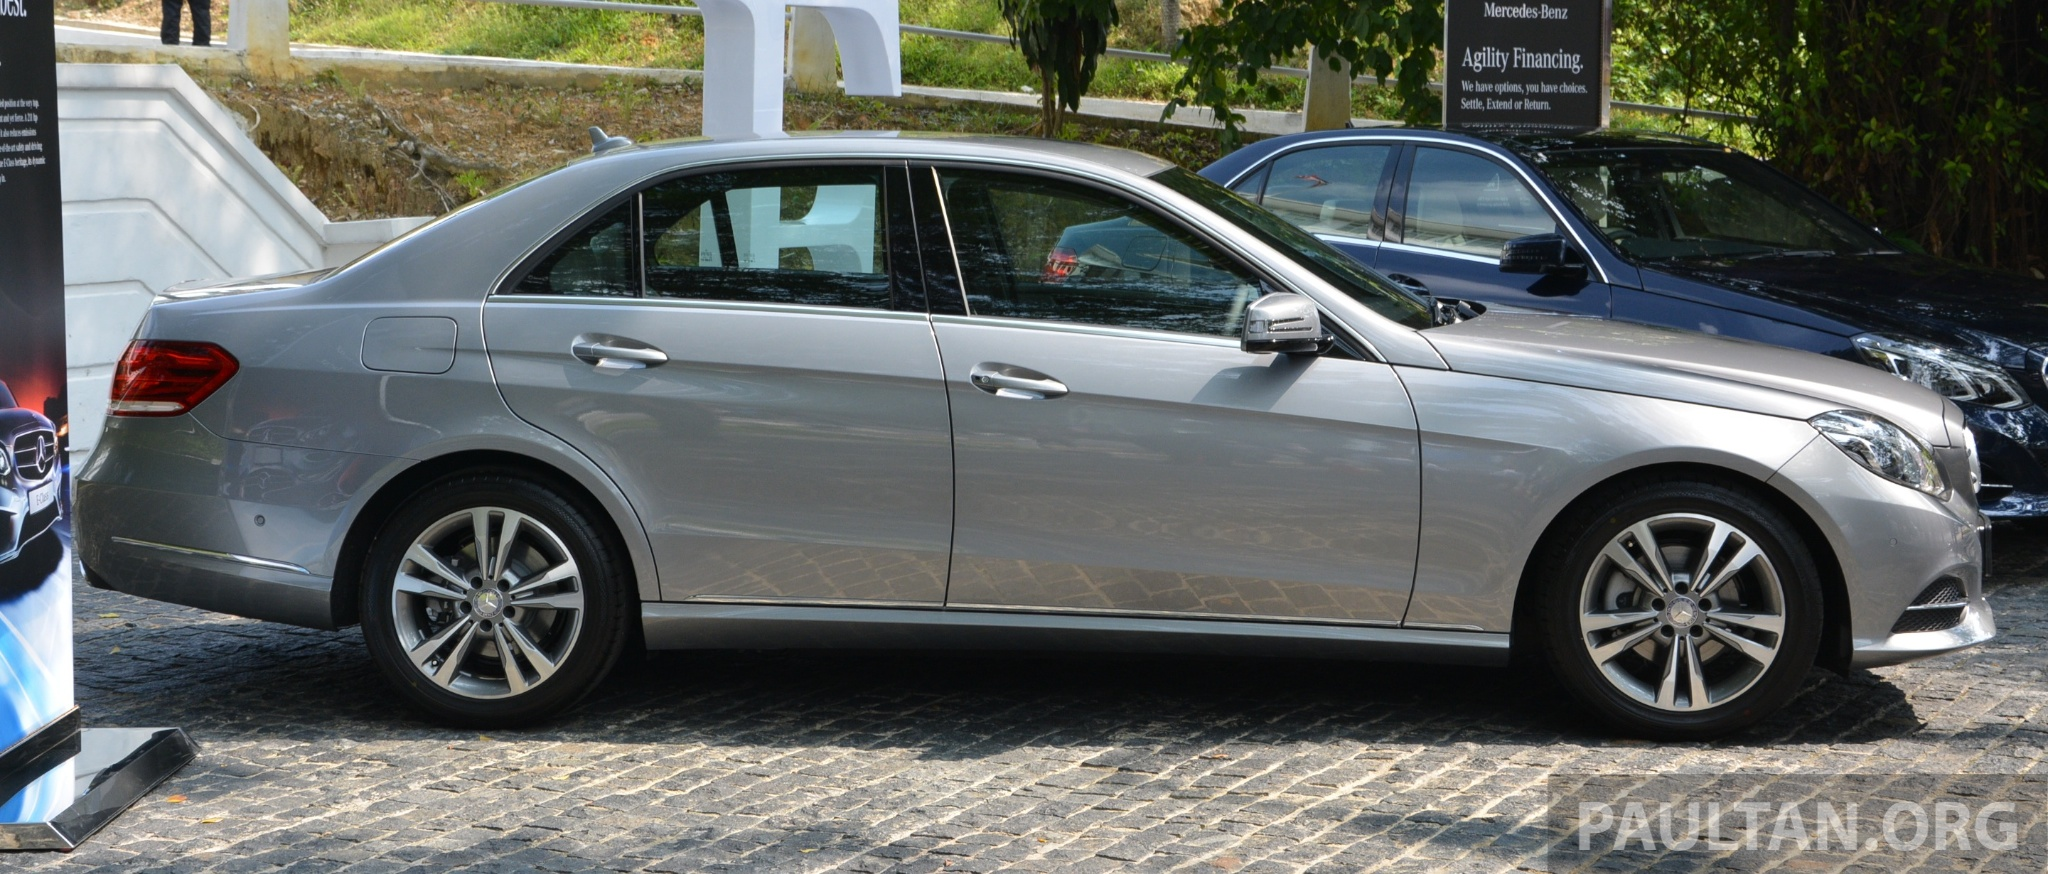 W212 Mercedes Benz E Class Facelift Launched E 200